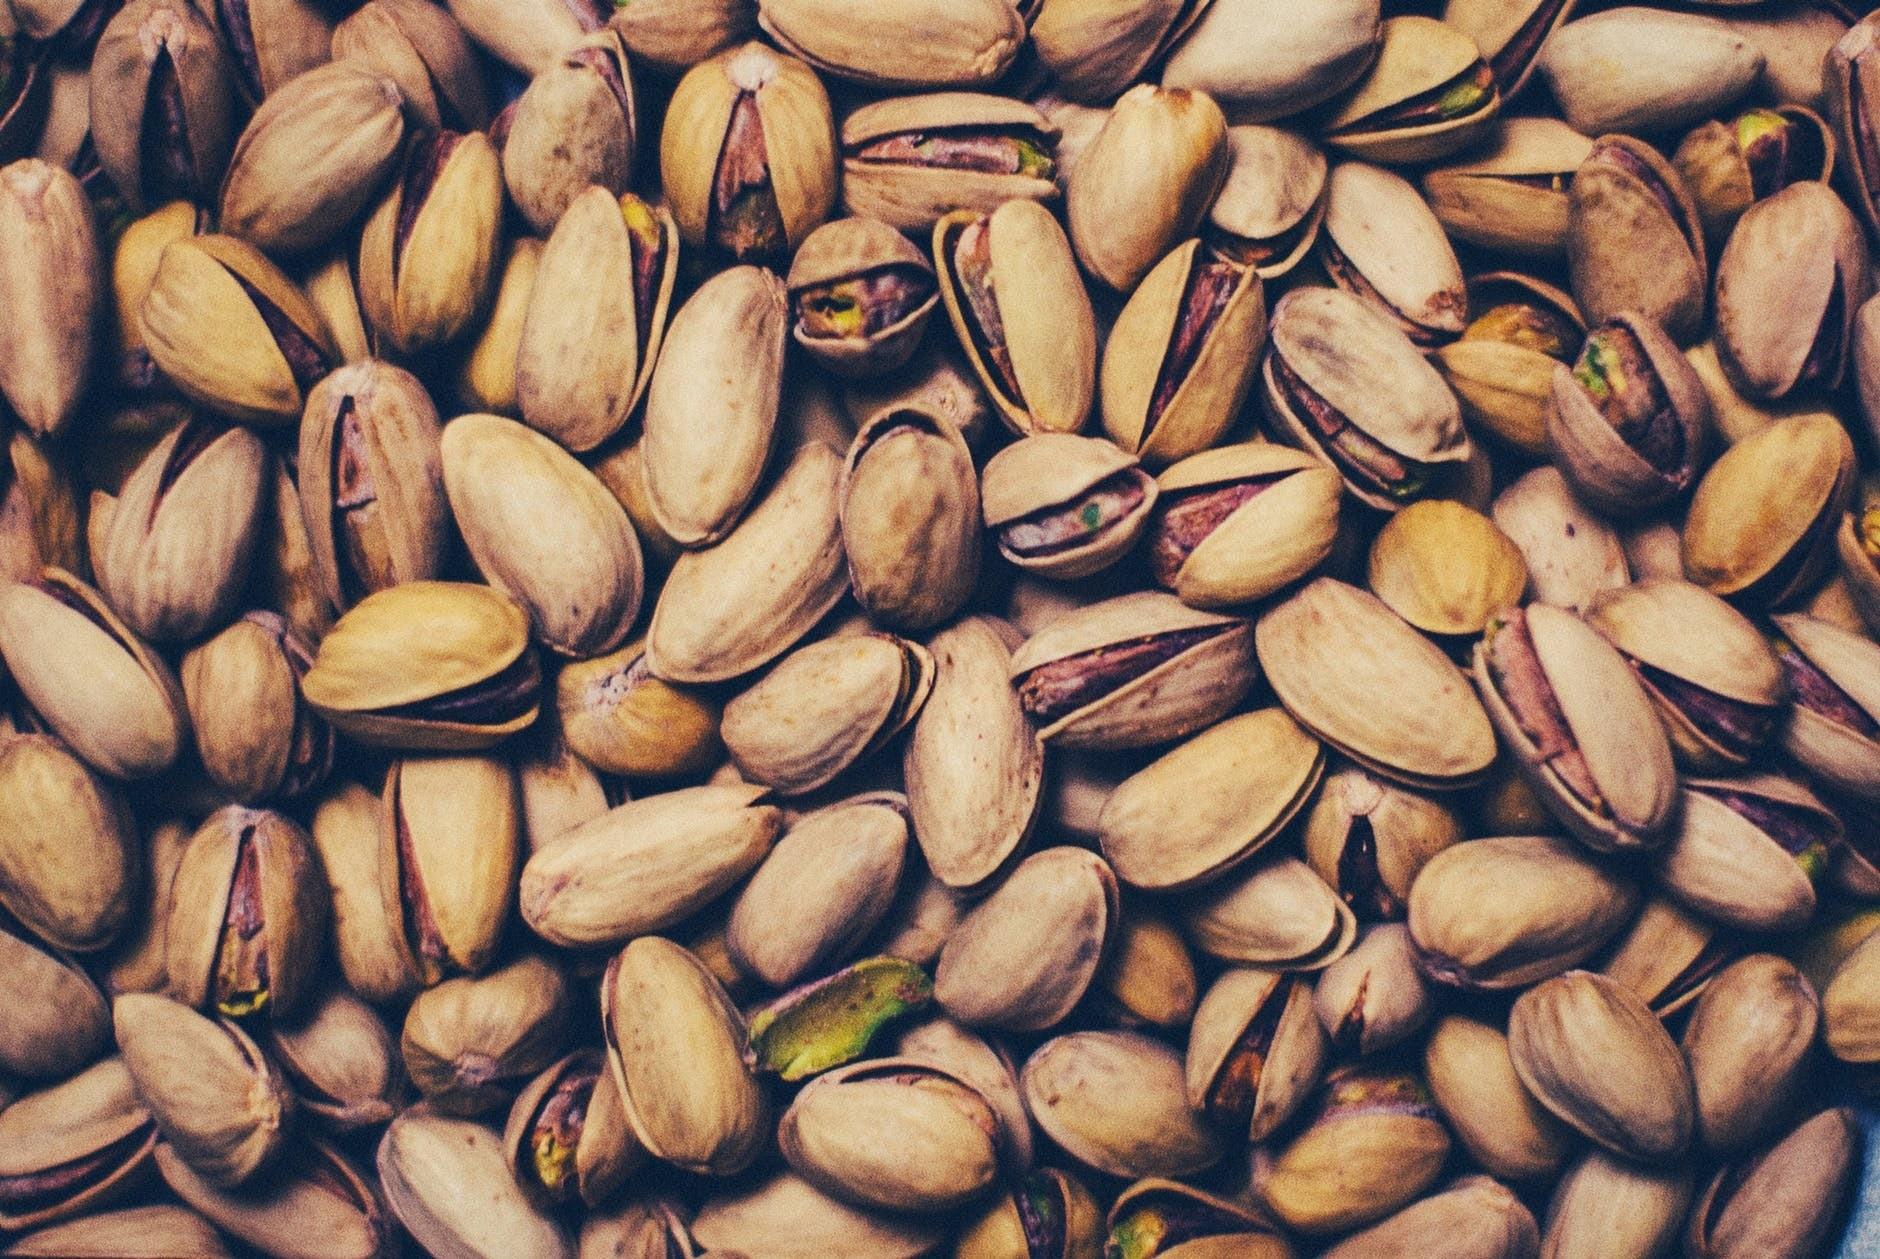 Как хранить орехи в домашних условиях